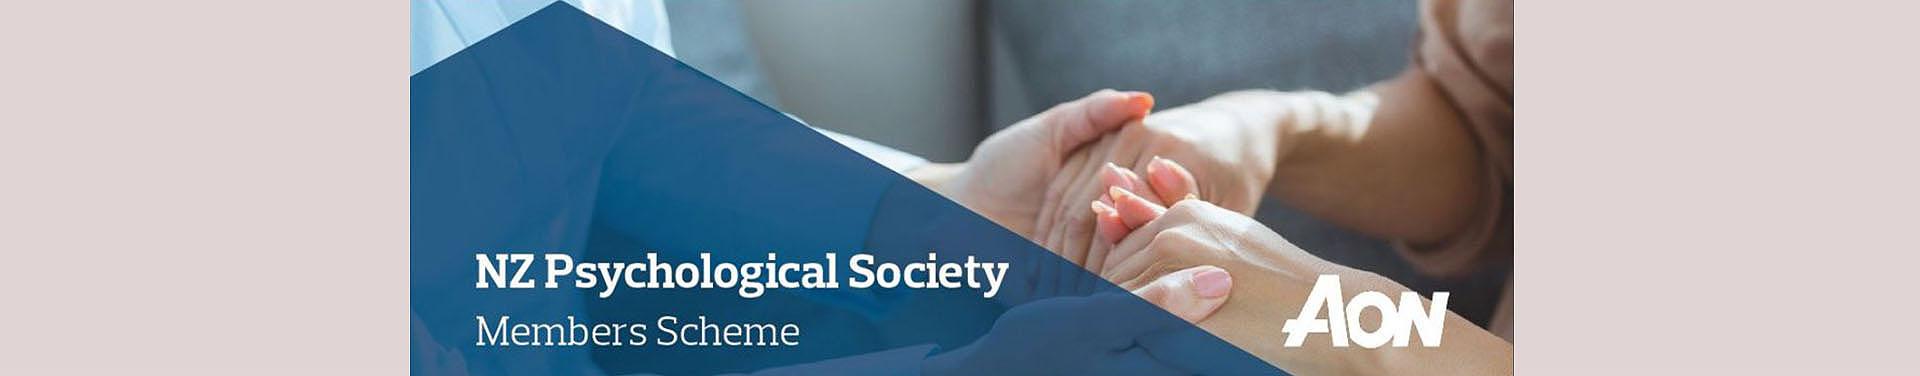 Indemnity Insurance :: NZ Psychological Society